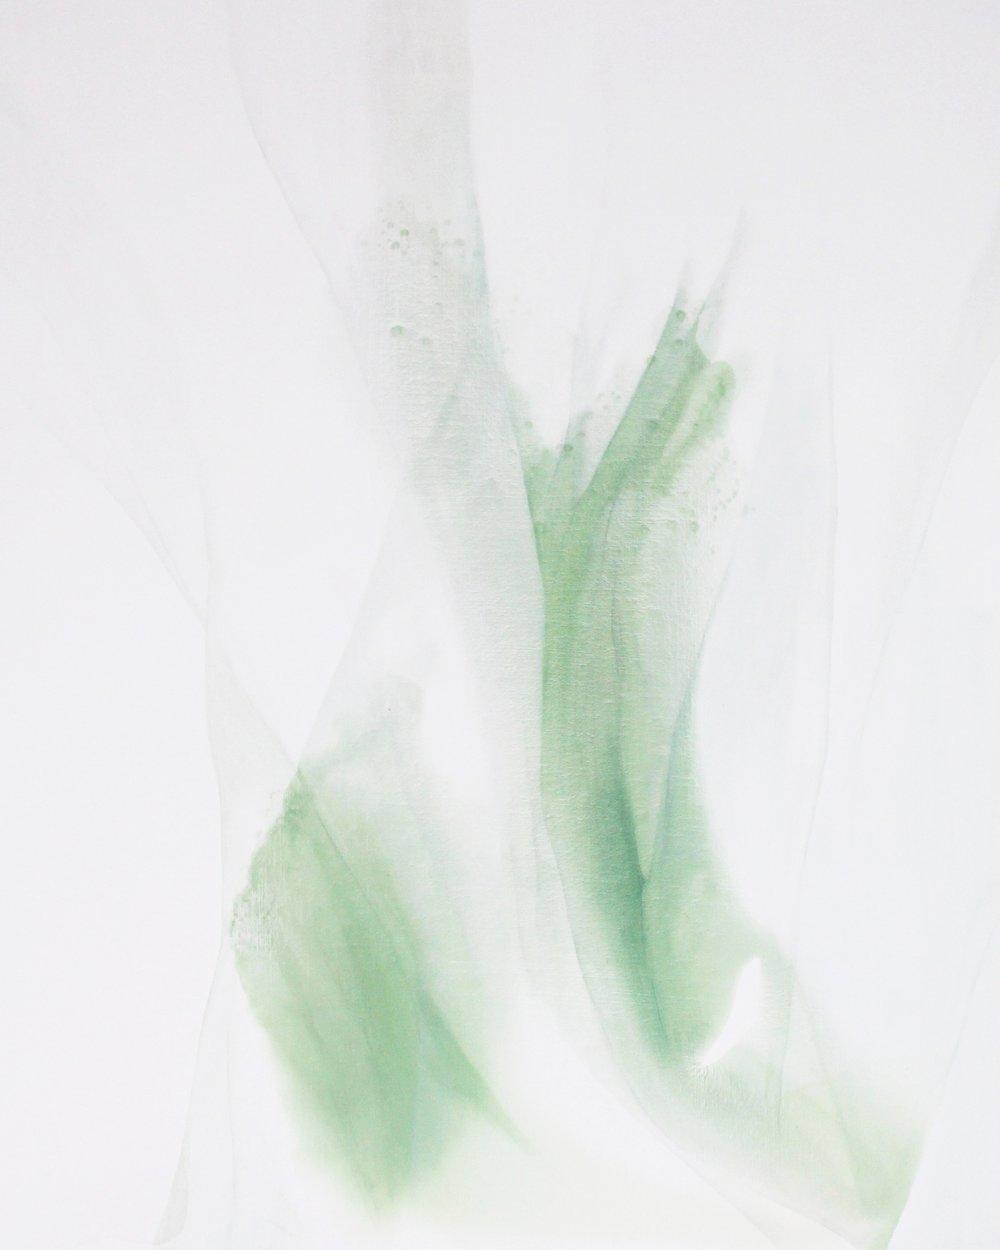 ephemeral_05  oil on canvas  80 X 100 cm  2017